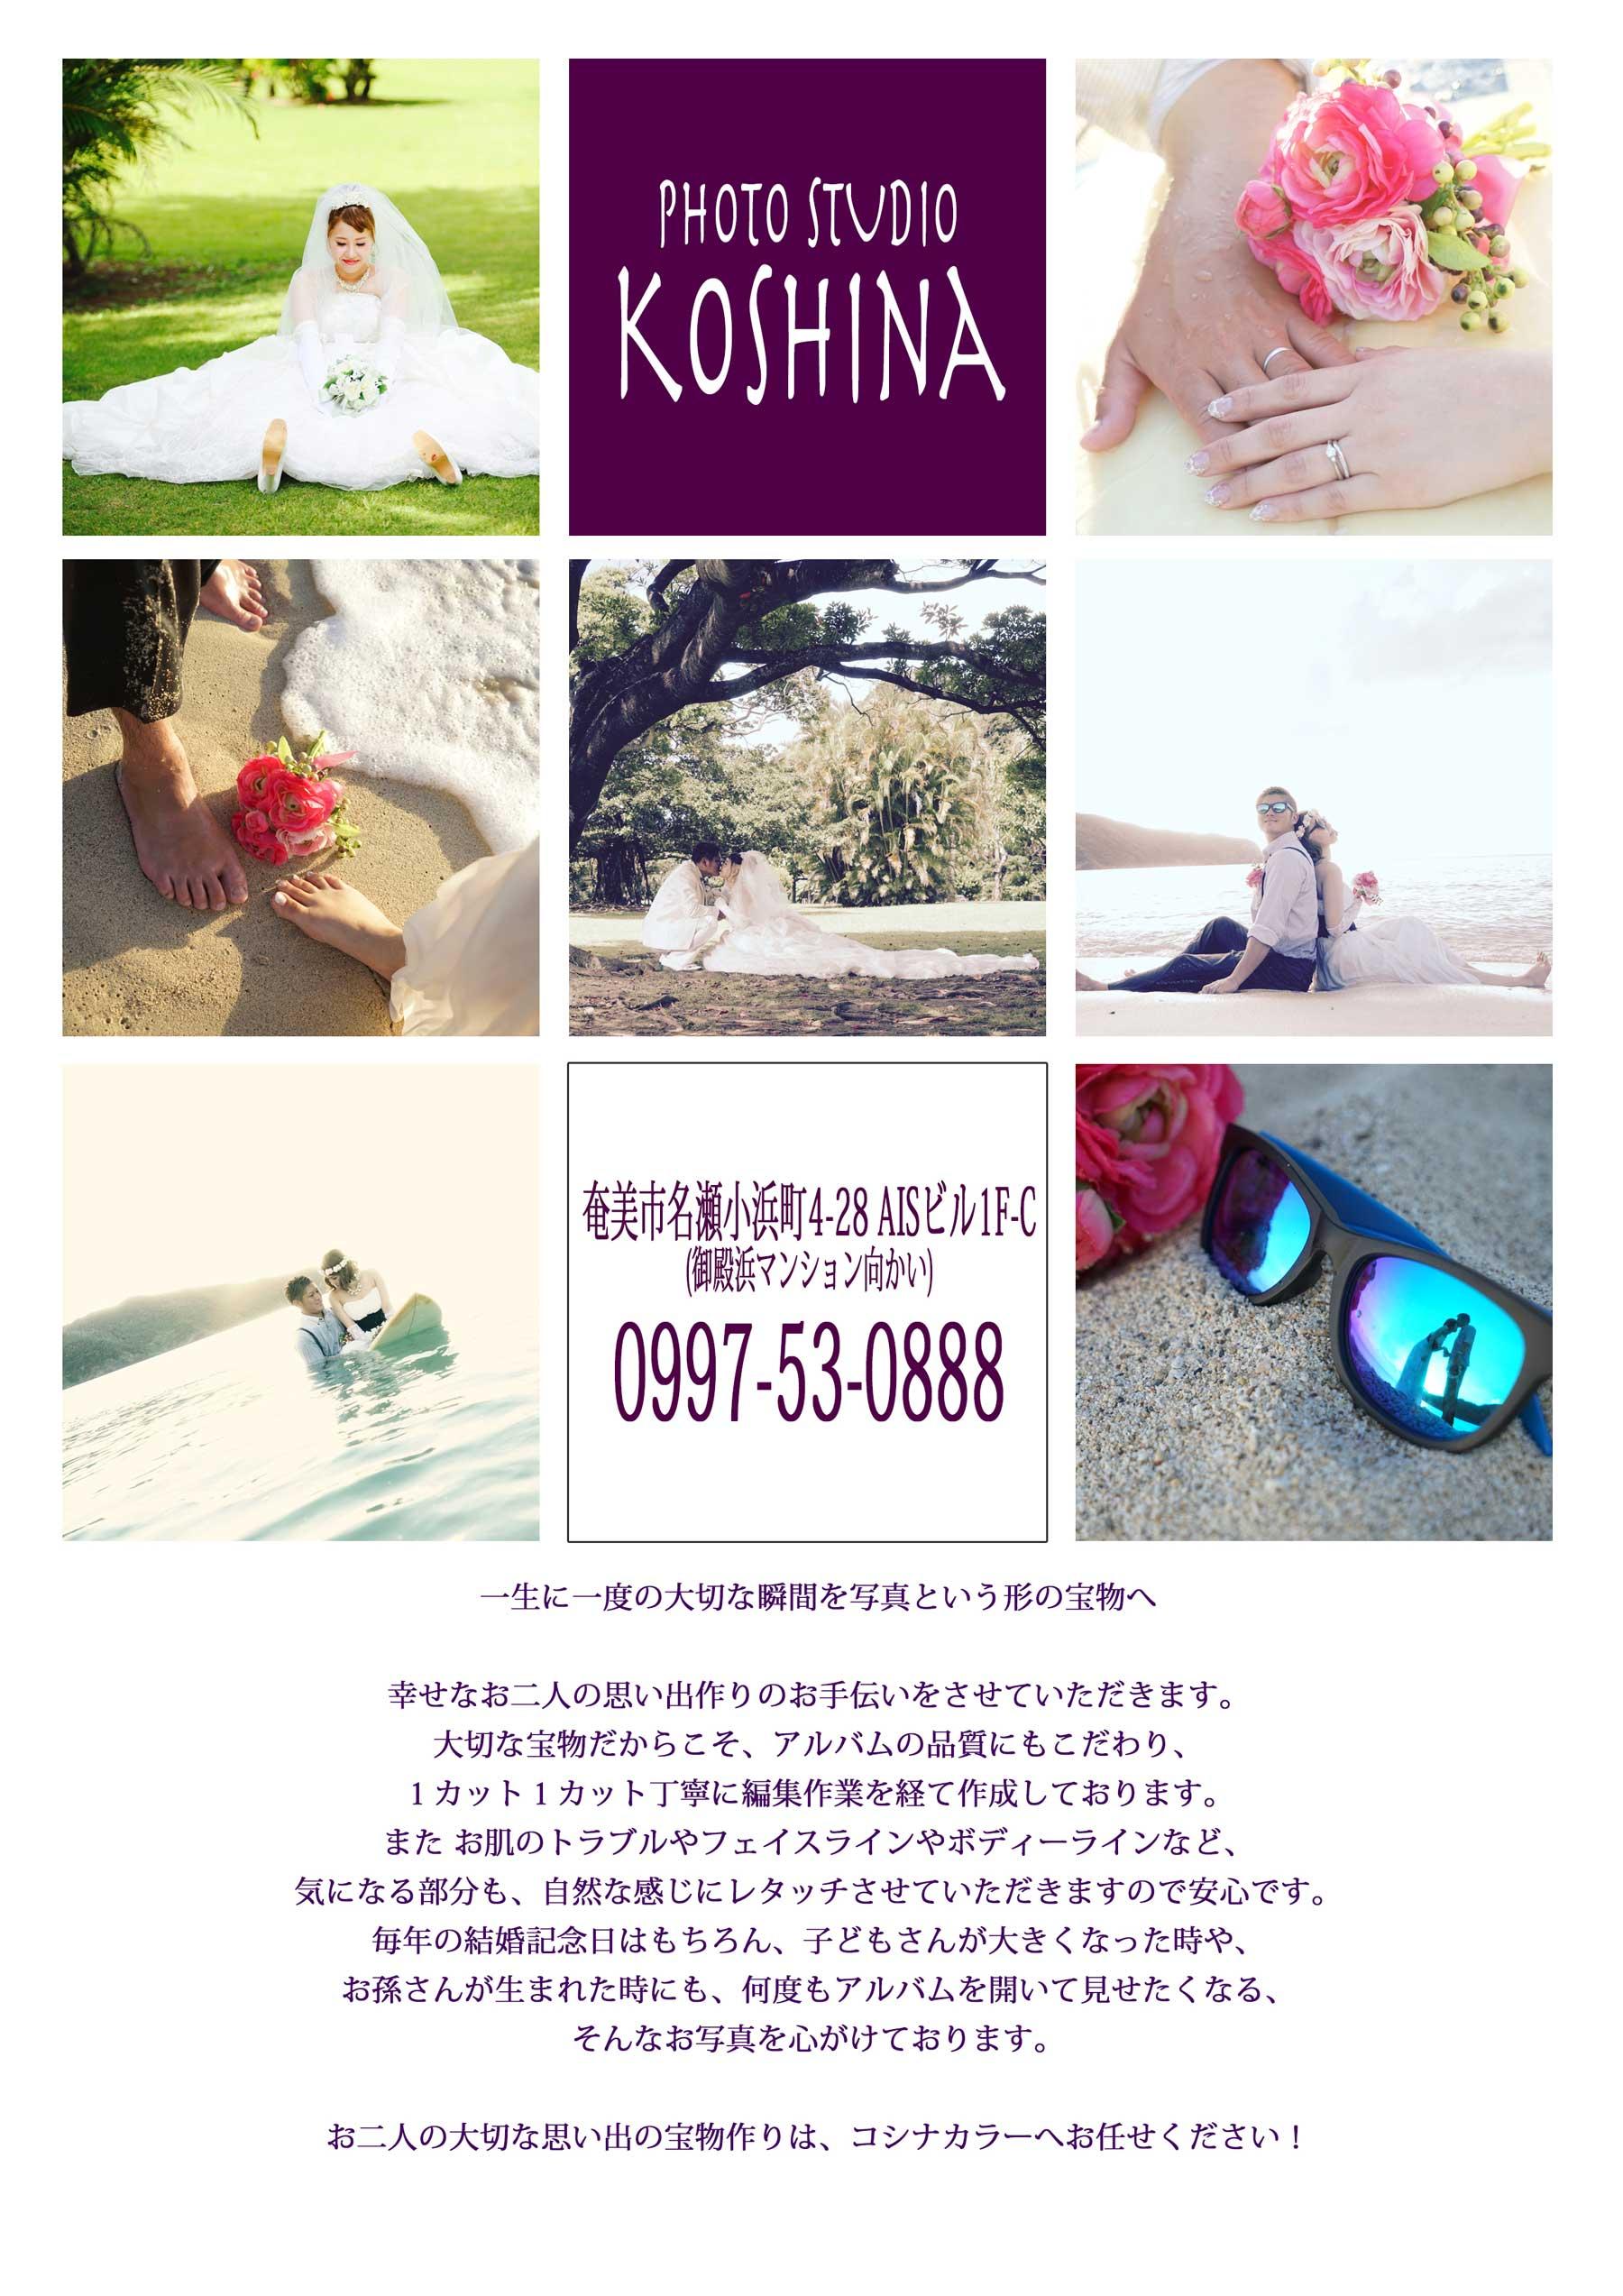 photo studio koshina ウェディング